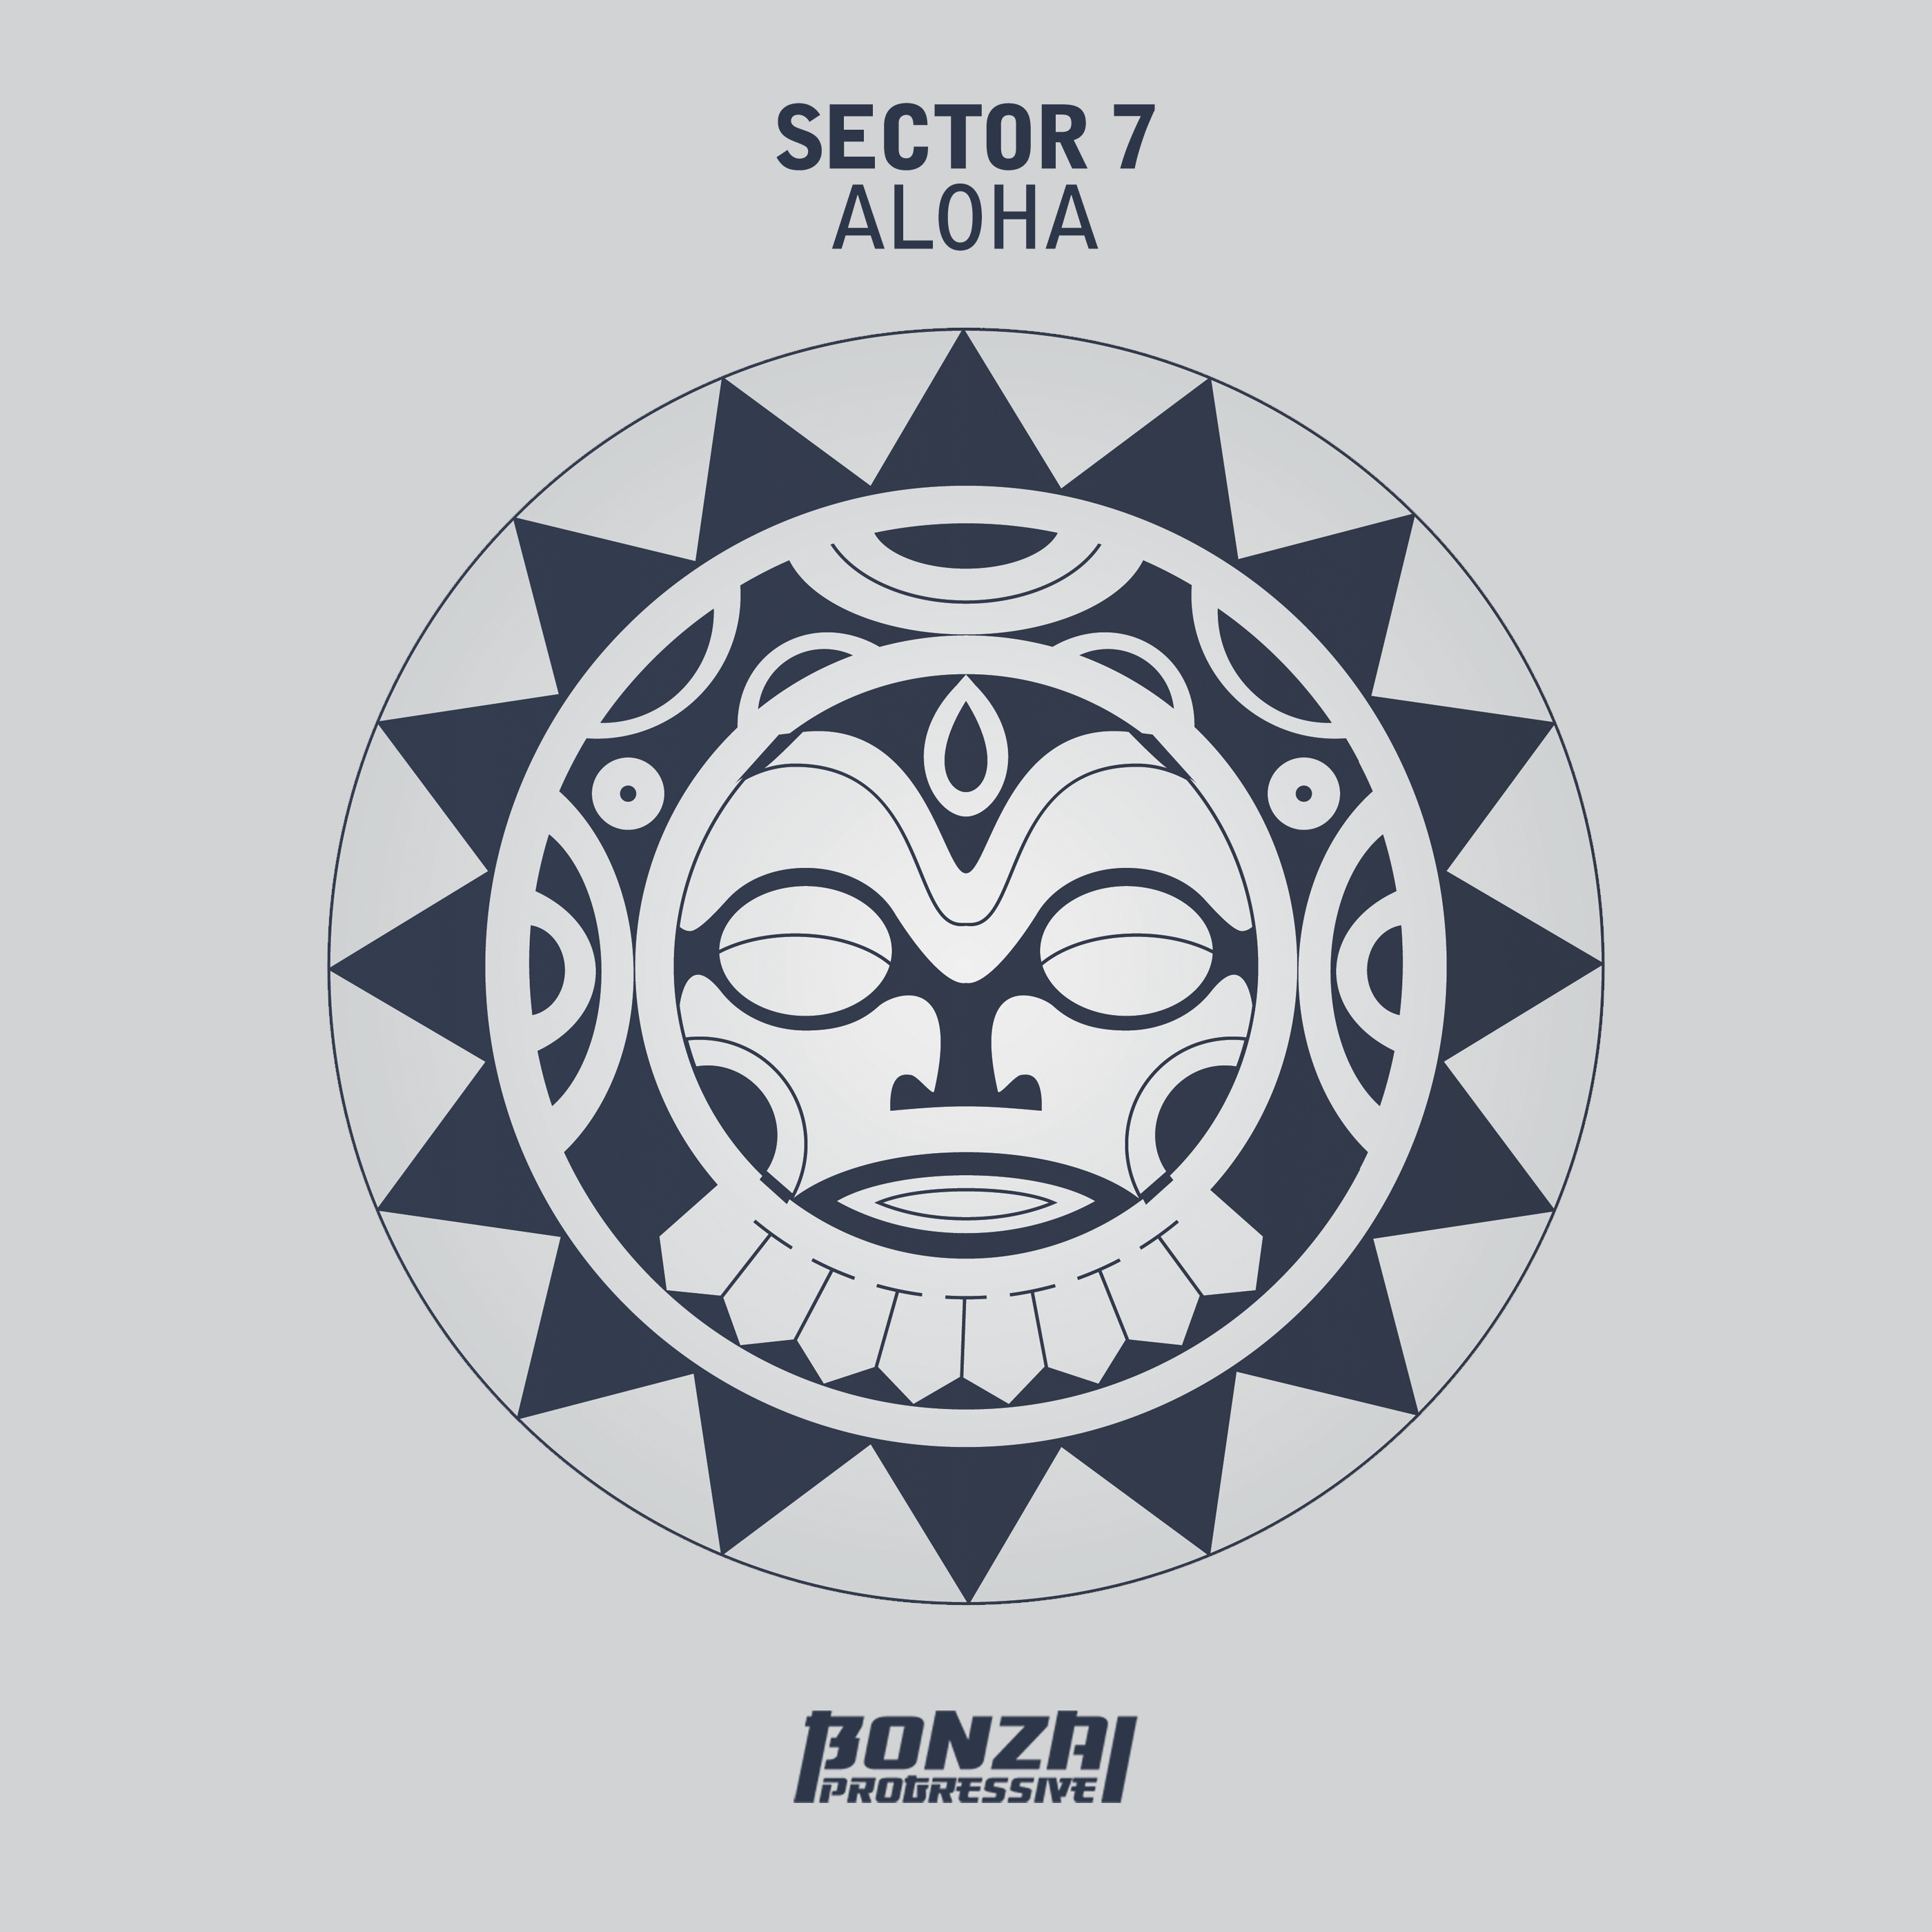 Sector7AlohaBonzaiProgressive